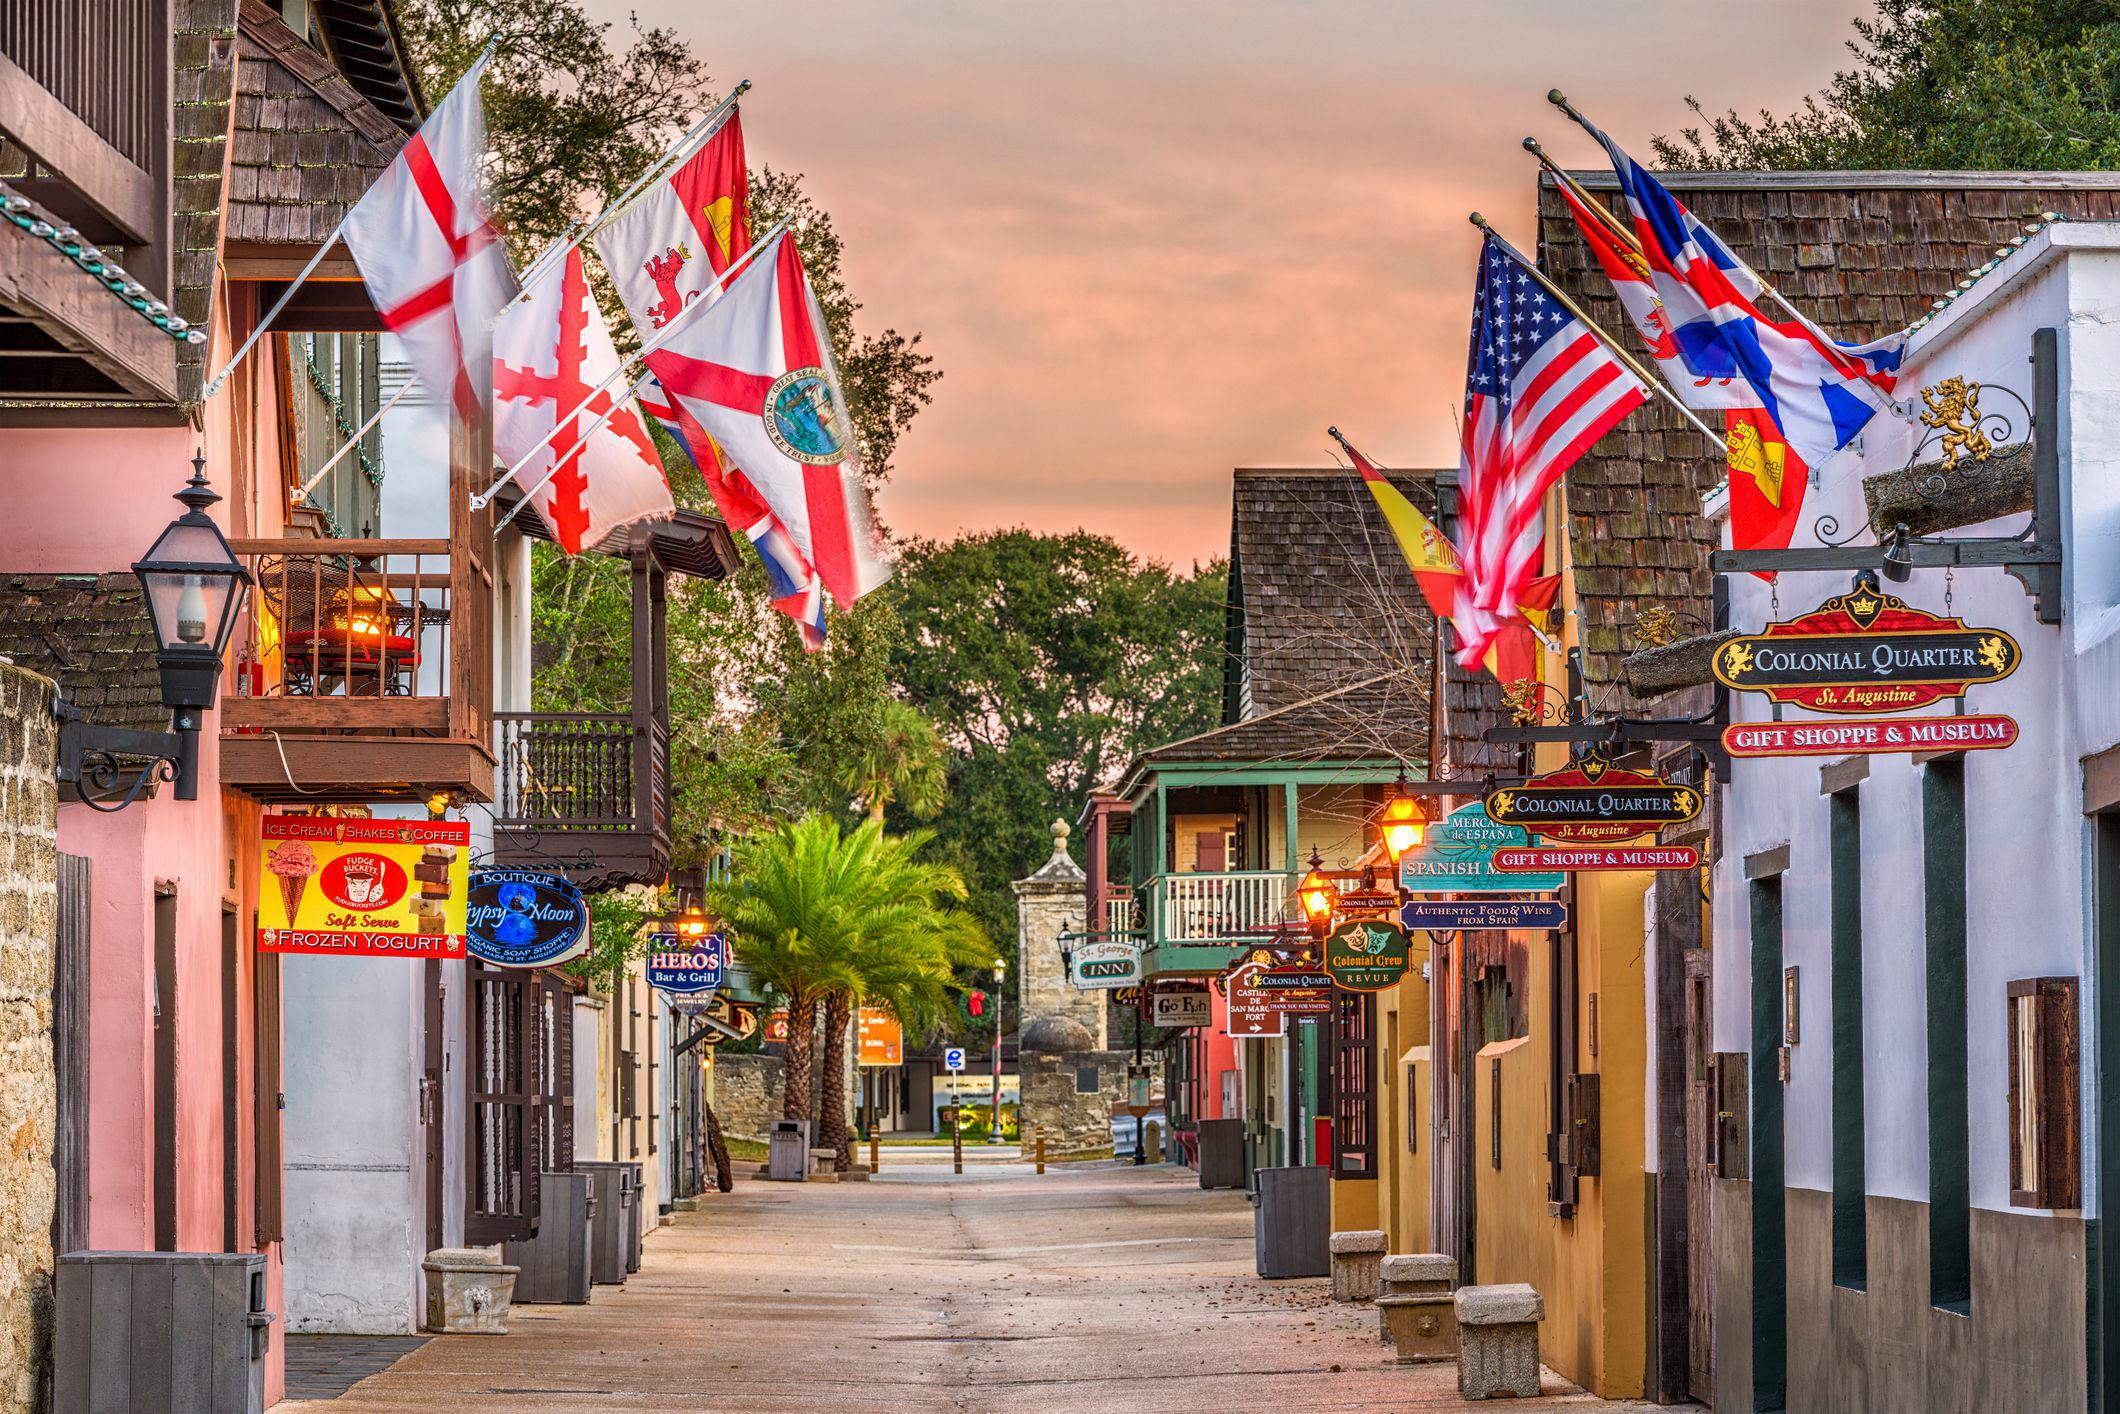 thành phố 1. St. Augustine, Florida